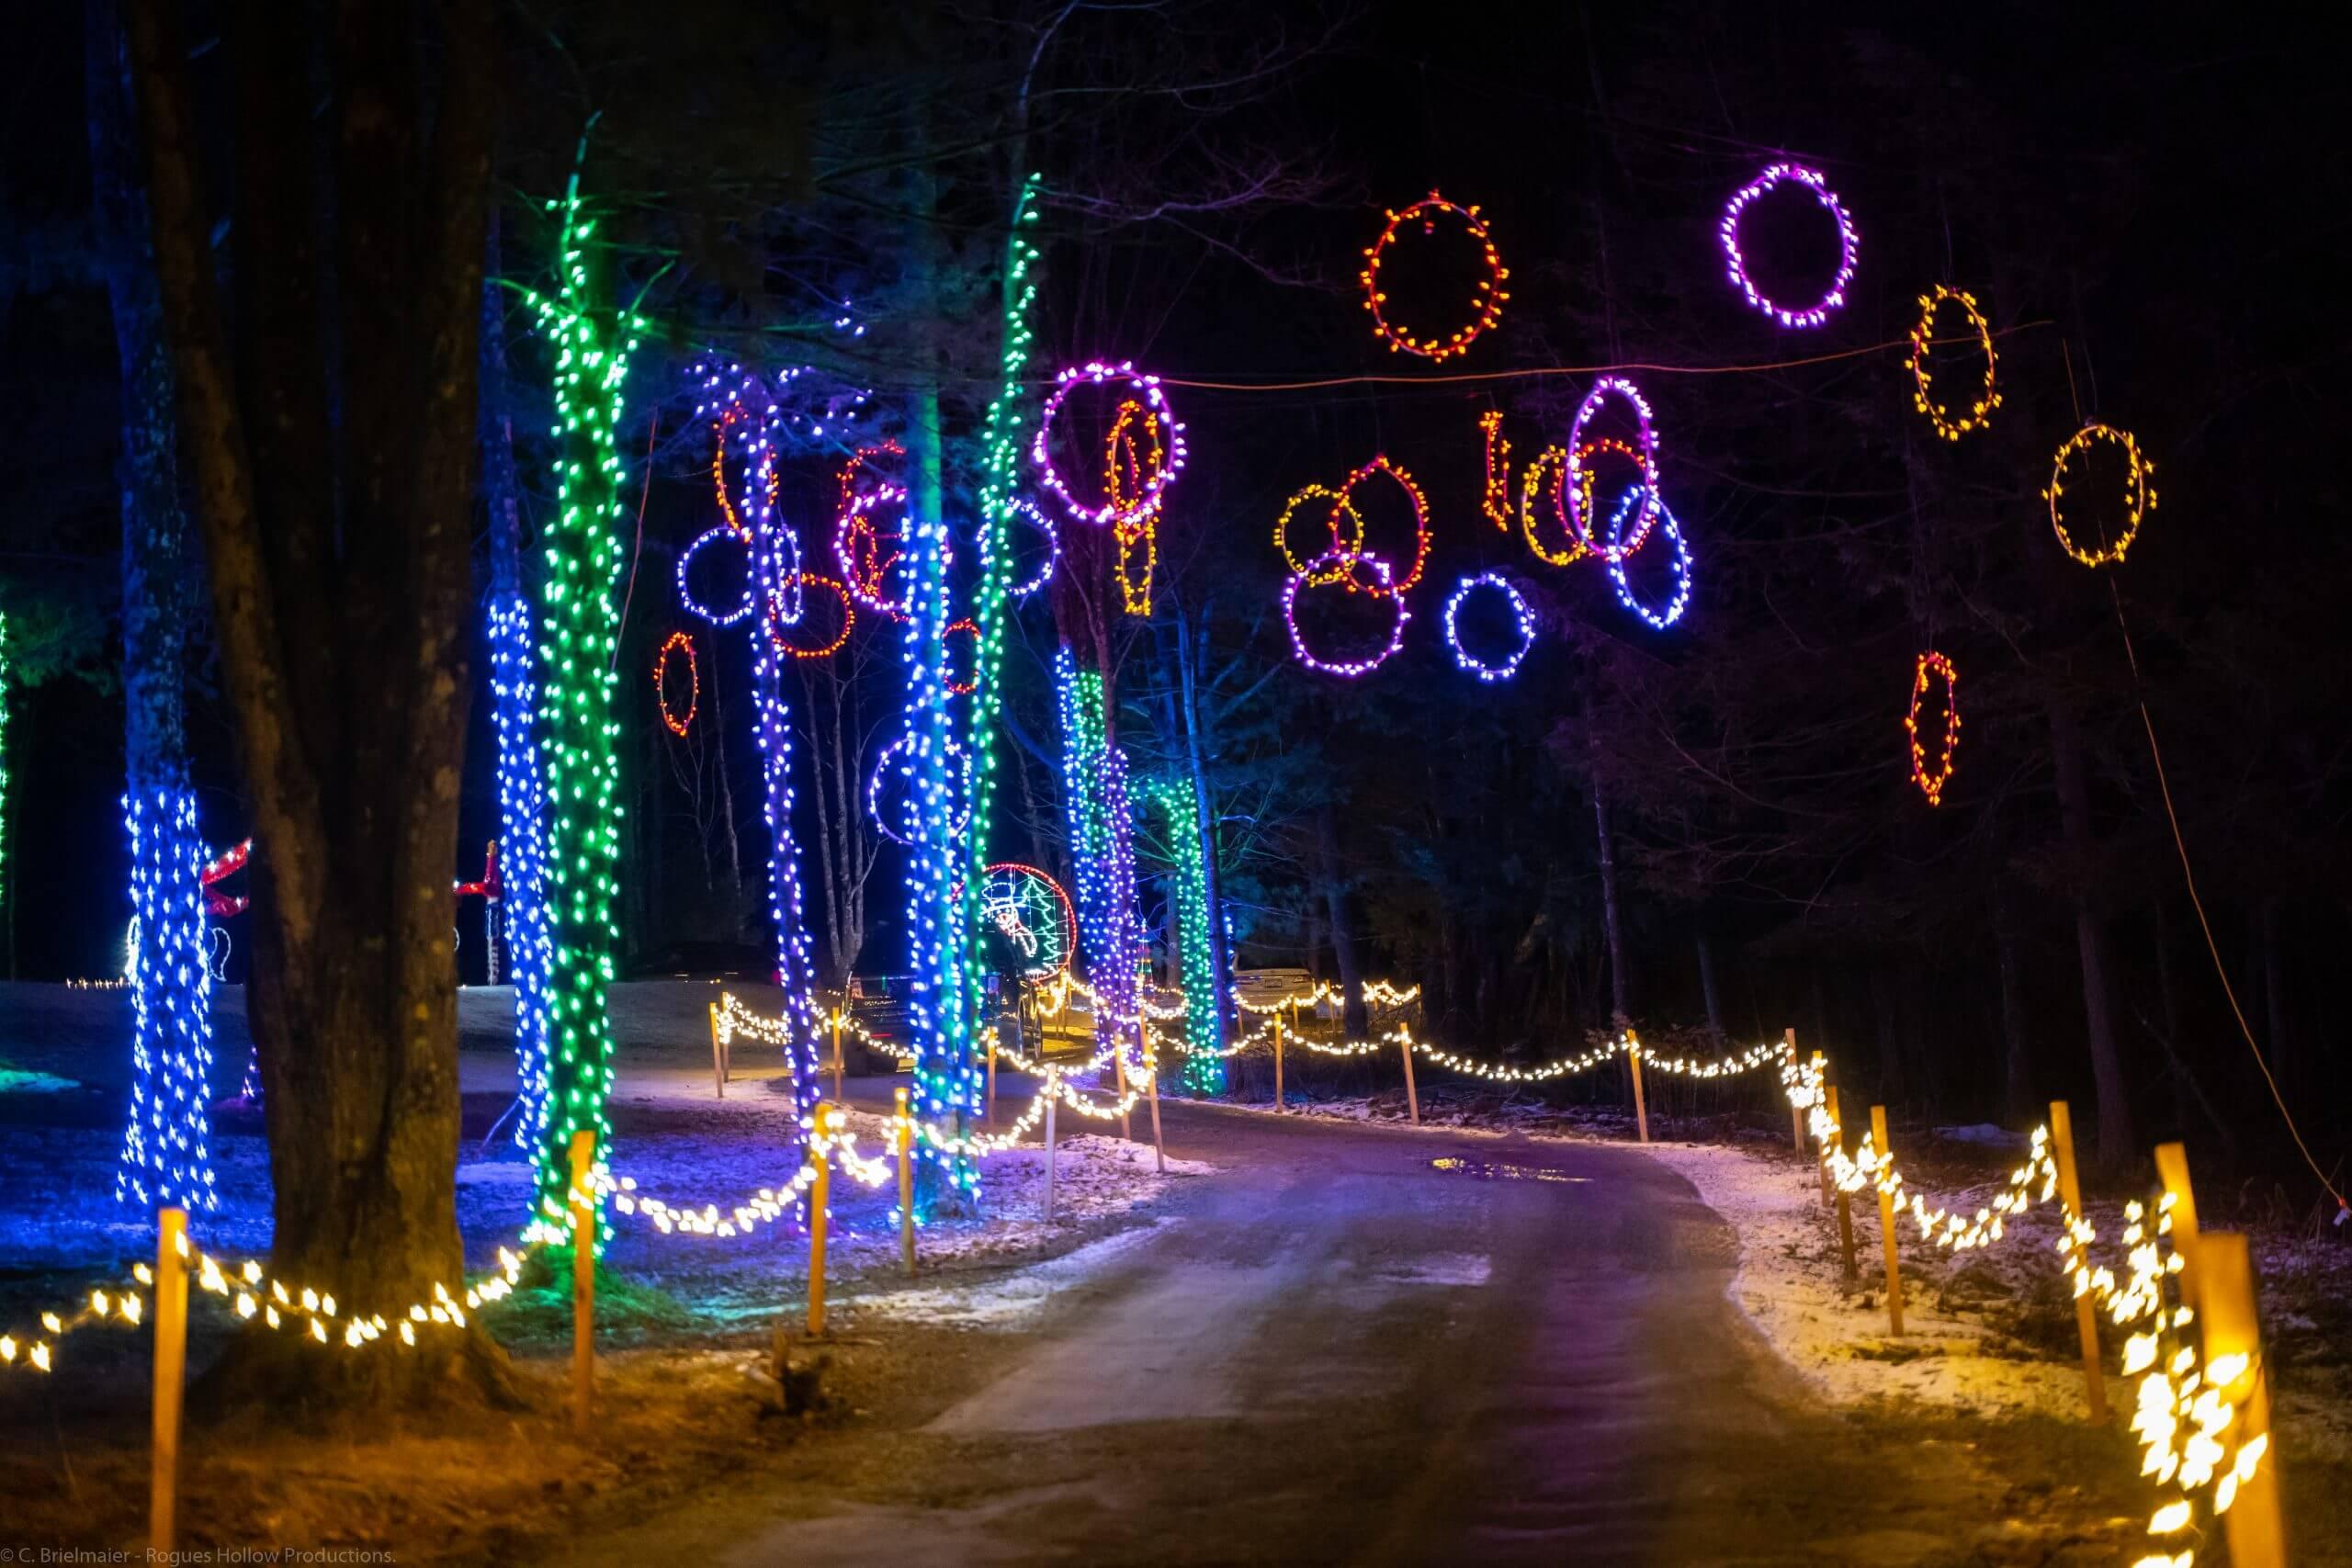 Hanging Holiday Light Displays